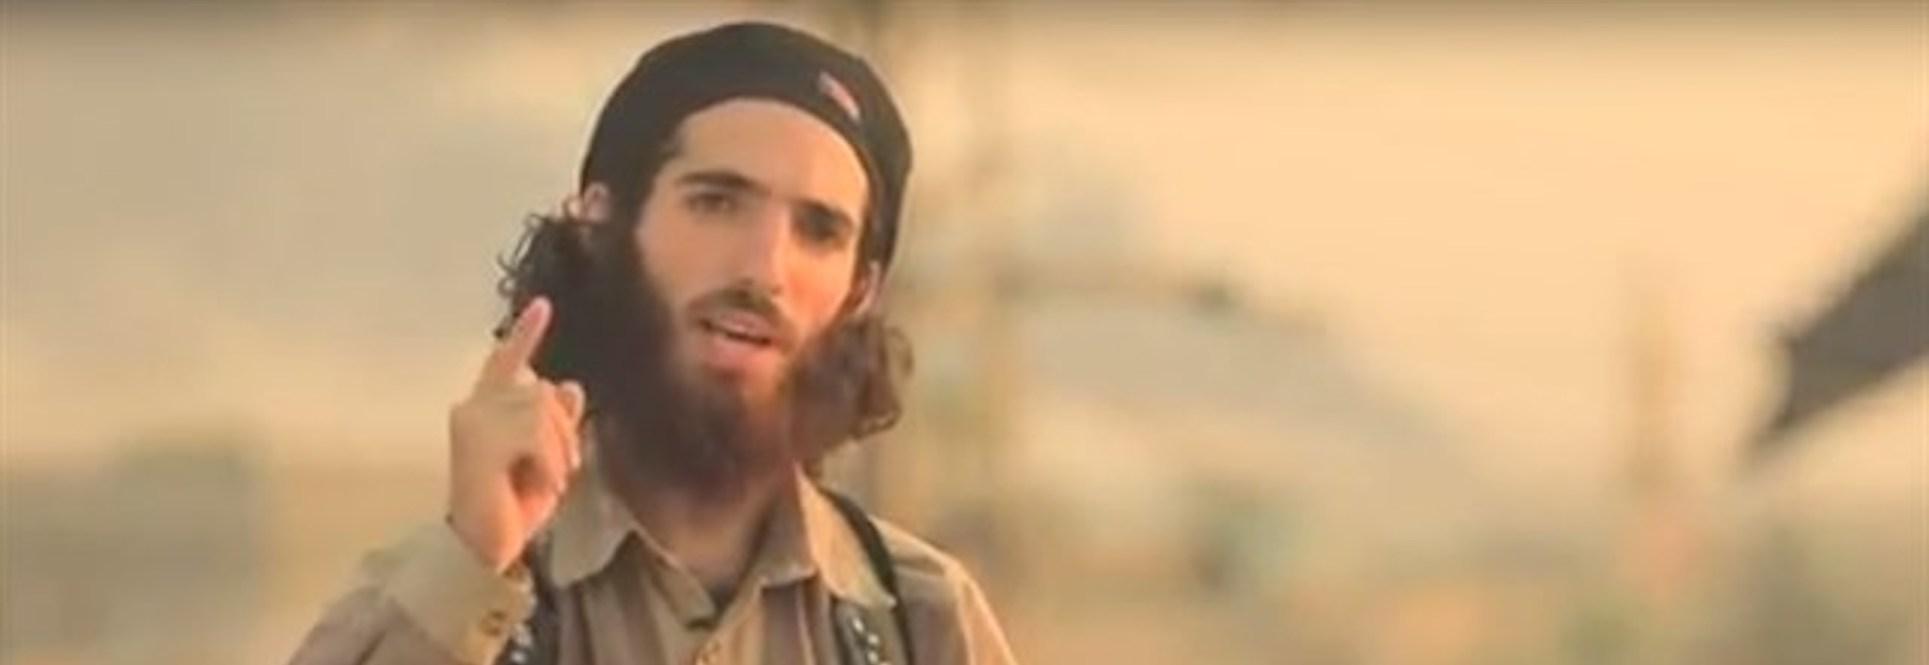 ISIS threatens Spain